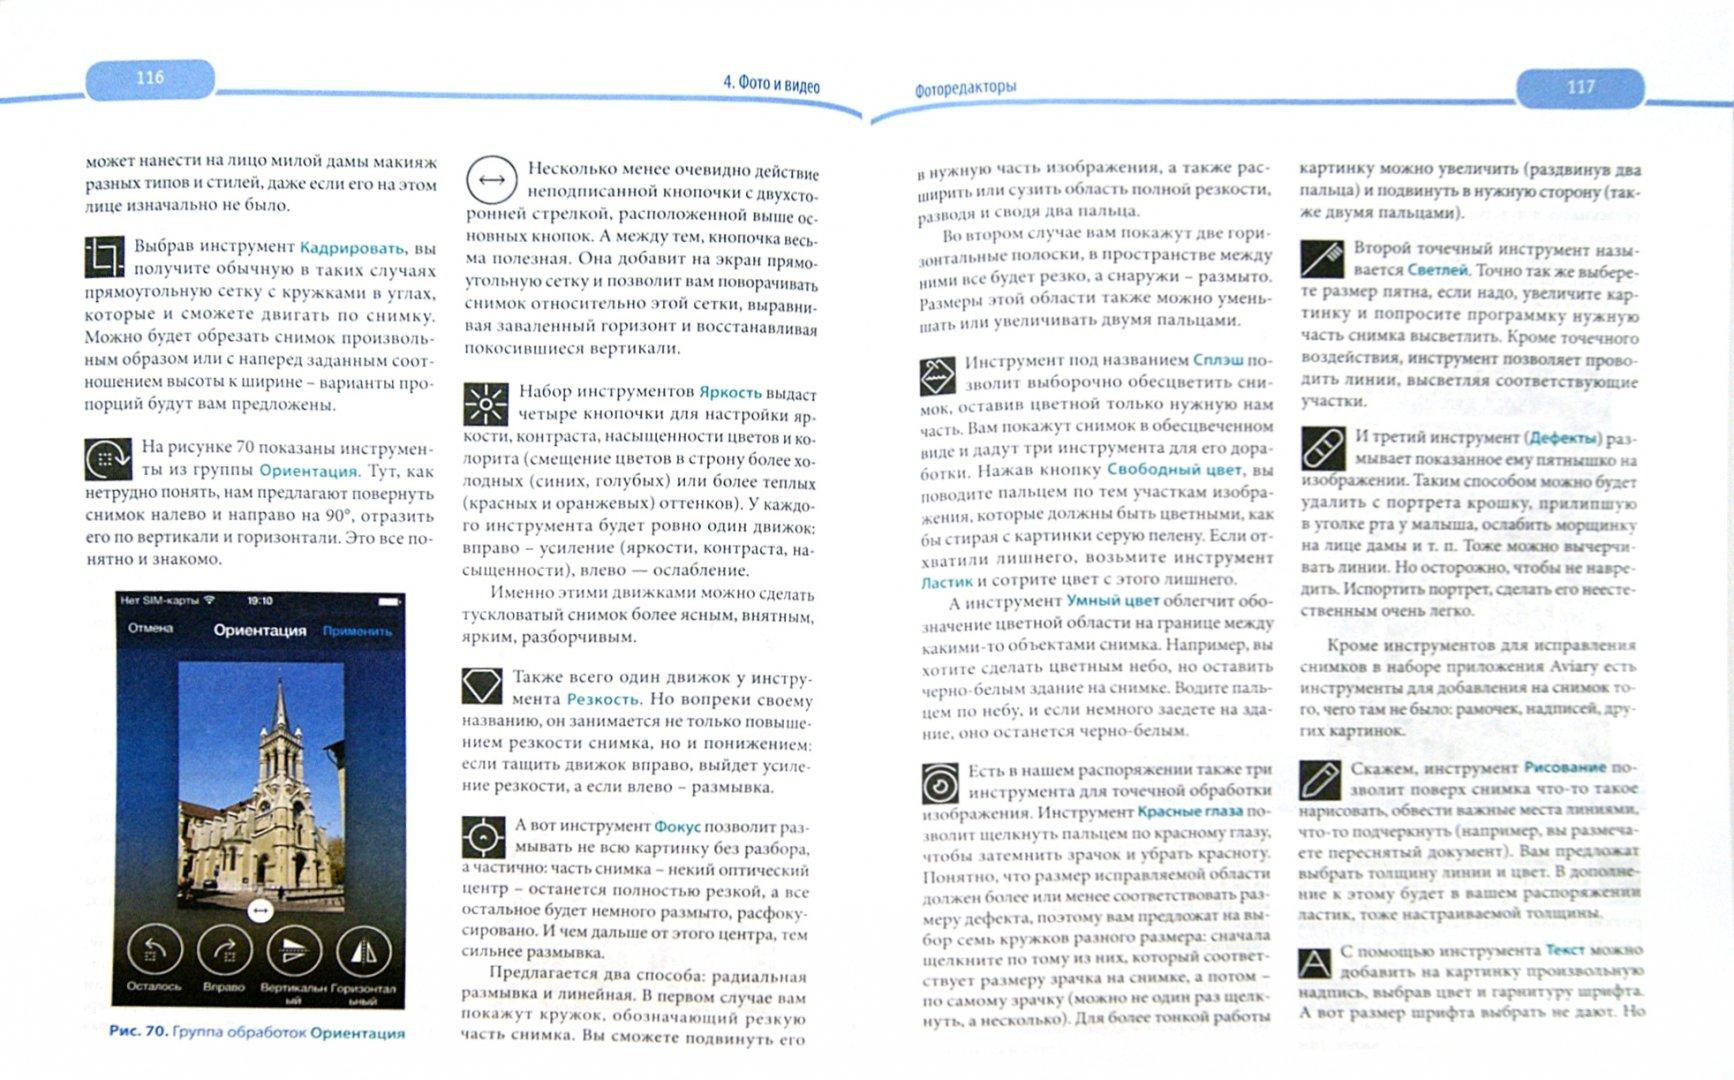 Иллюстрация 1 из 8 для iPad и iPhone. Самоучитель Левина в цвете - Александр Левин | Лабиринт - книги. Источник: Лабиринт